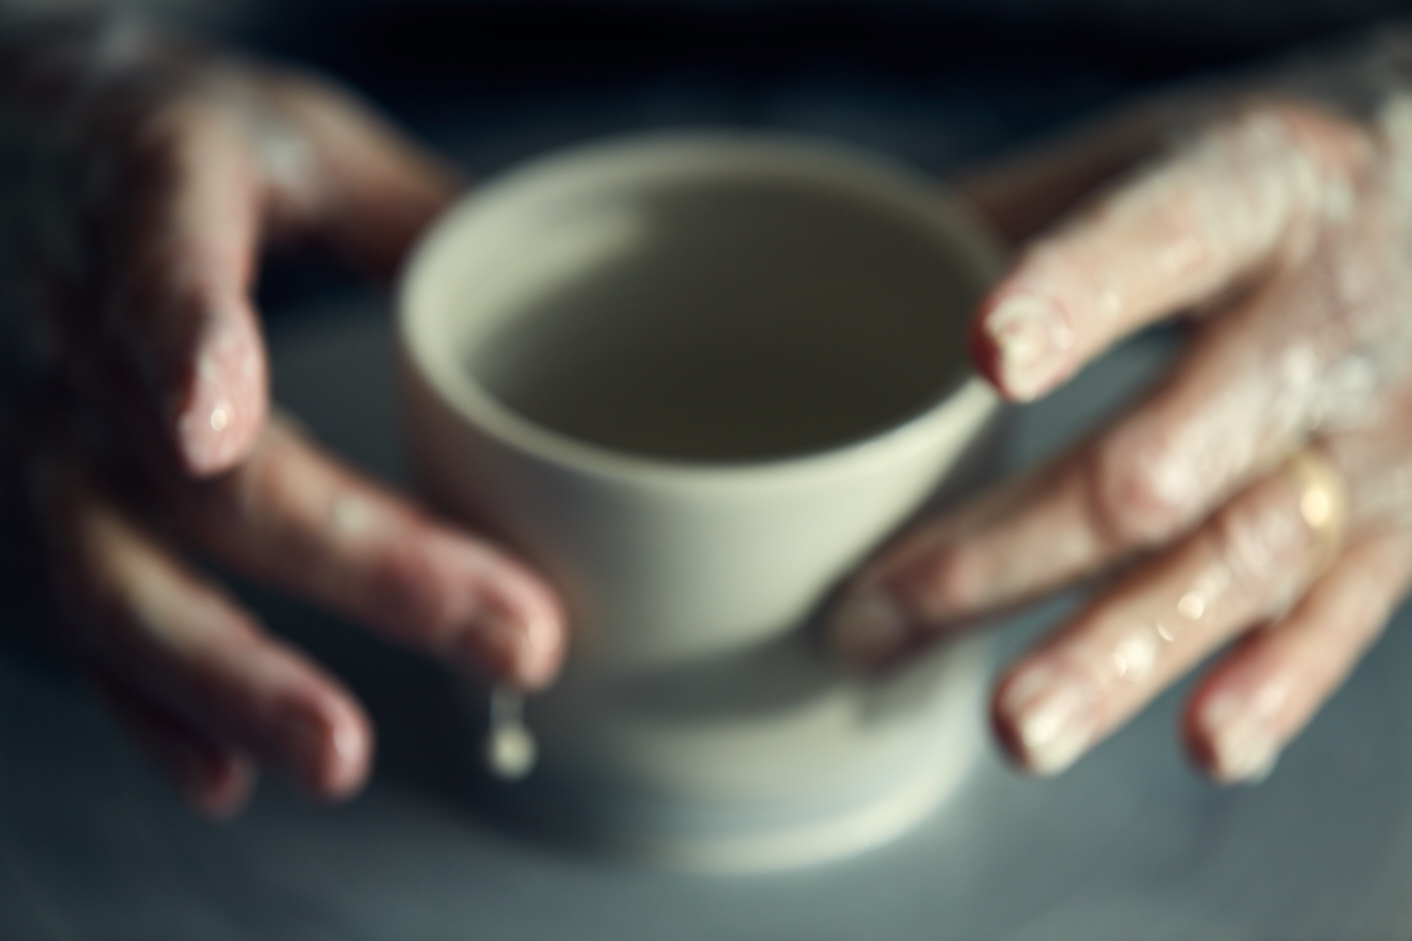 170610 Mum Pottery 194.jpg